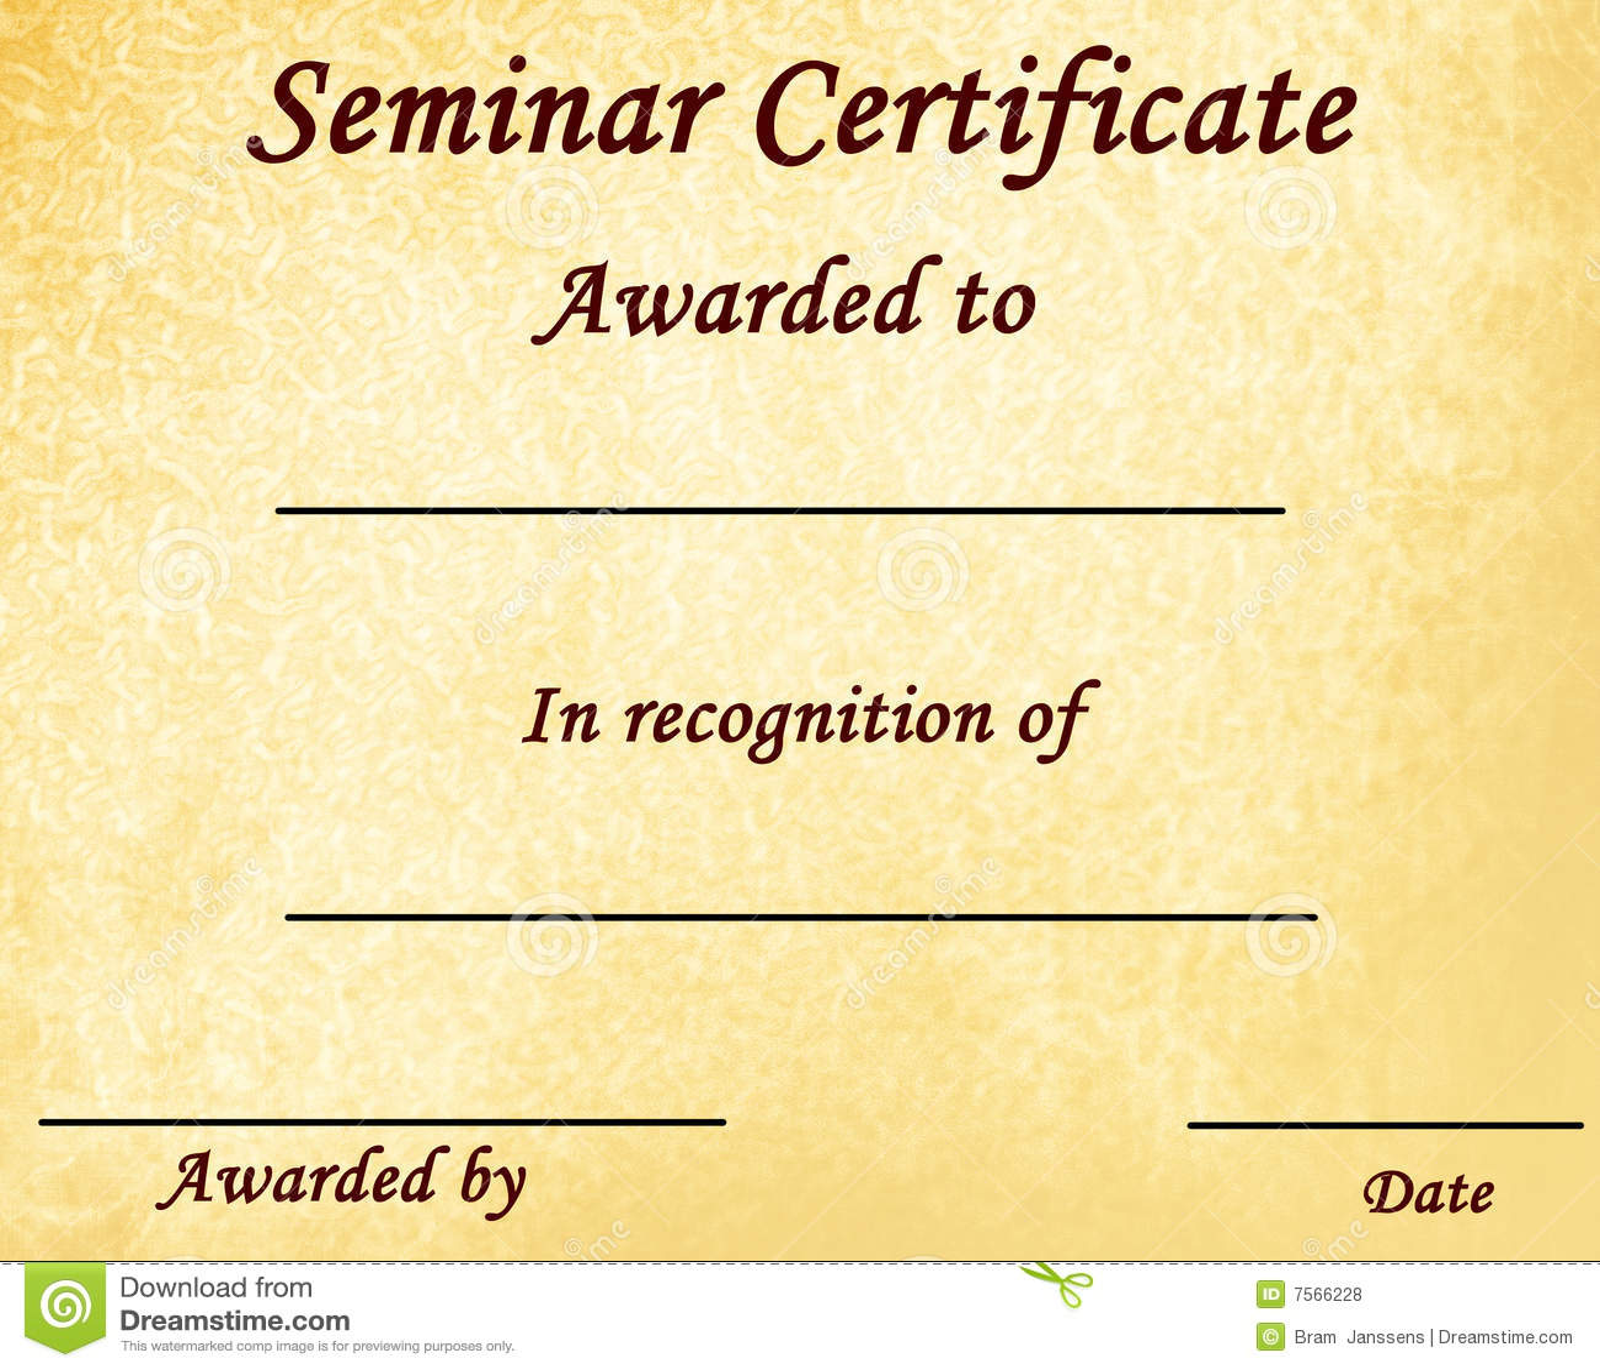 Online 3d Room Design Seminar Certificate Royalty Free Stock Photos Image 7566228